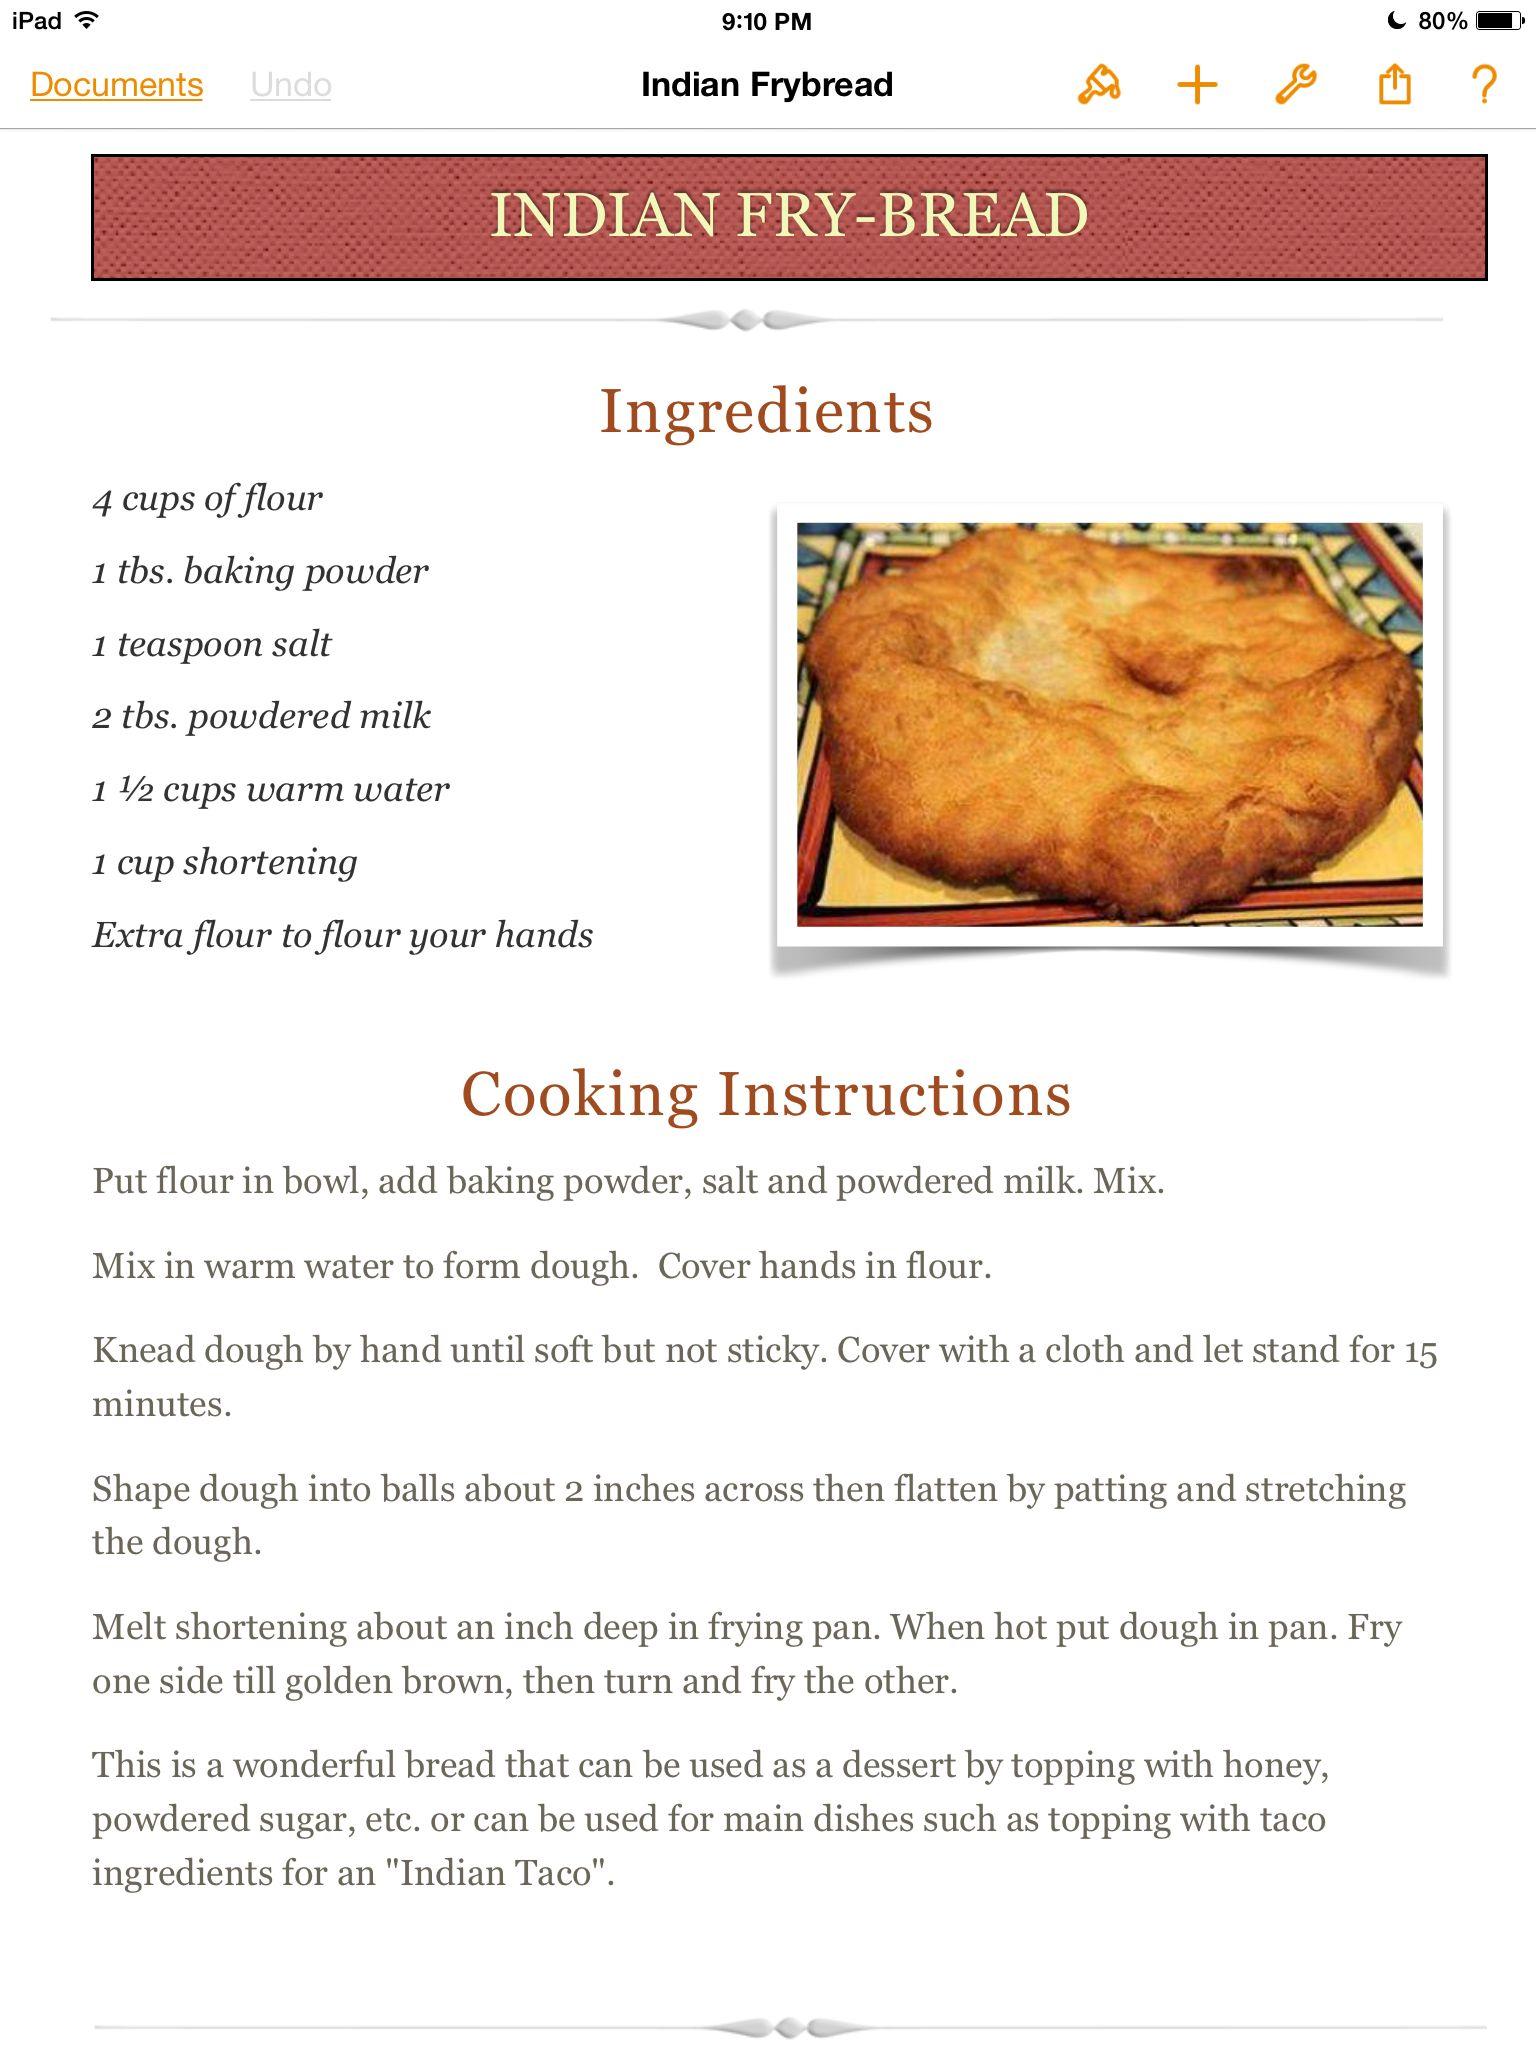 Indian Fry-Bread | Recipes, Food, Fry bread